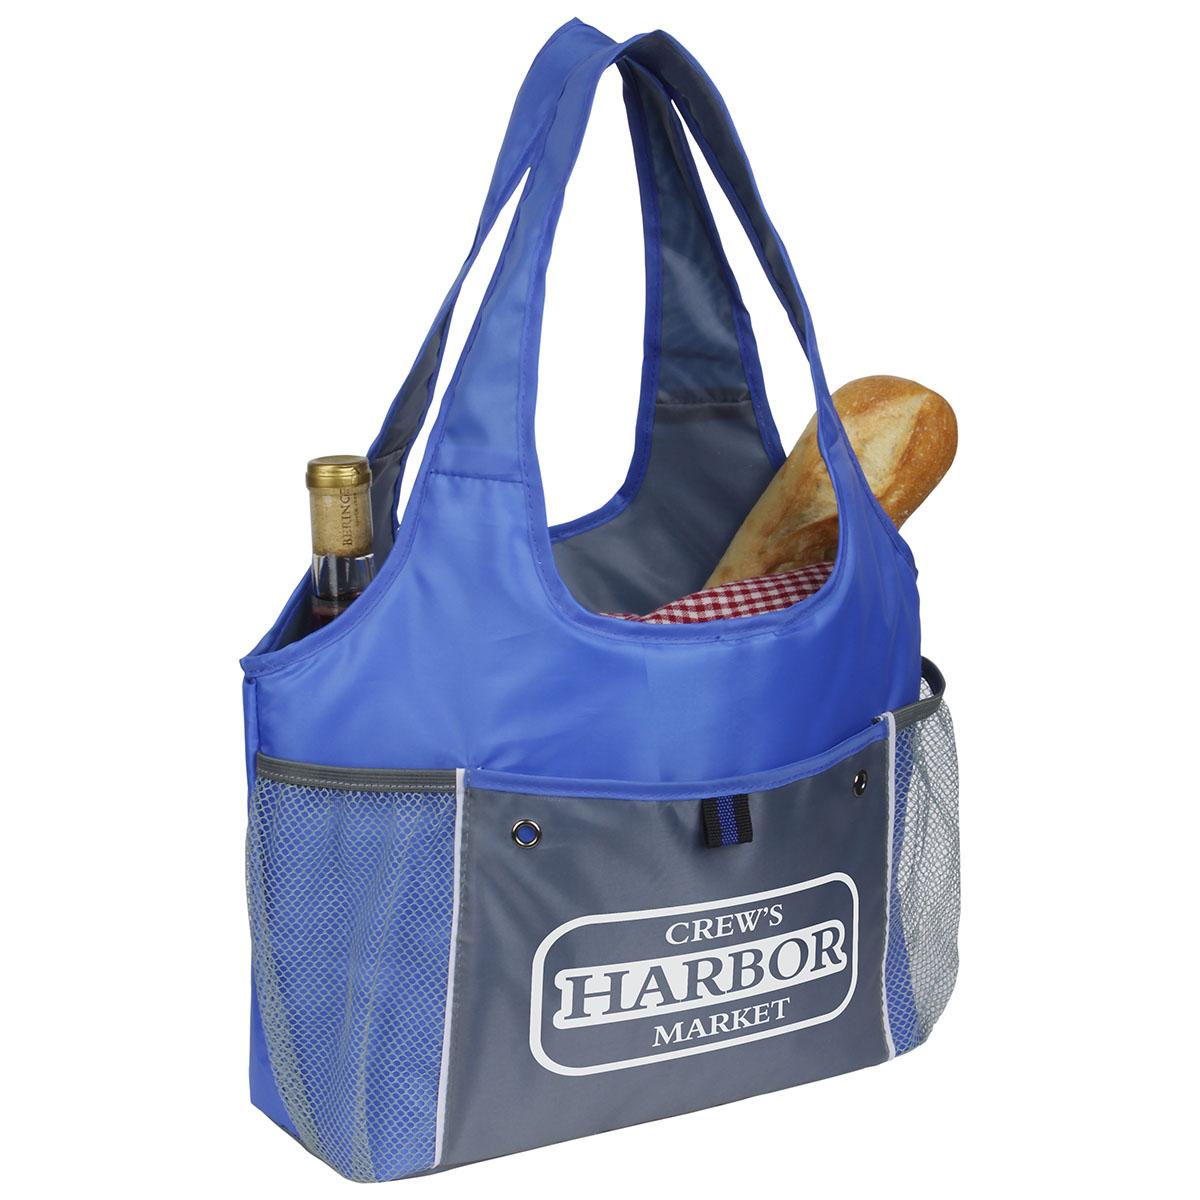 Frostline Cooler Bag w/ Built-in Carrying Strap, WBA-FC13 - 1 Colour Imprint